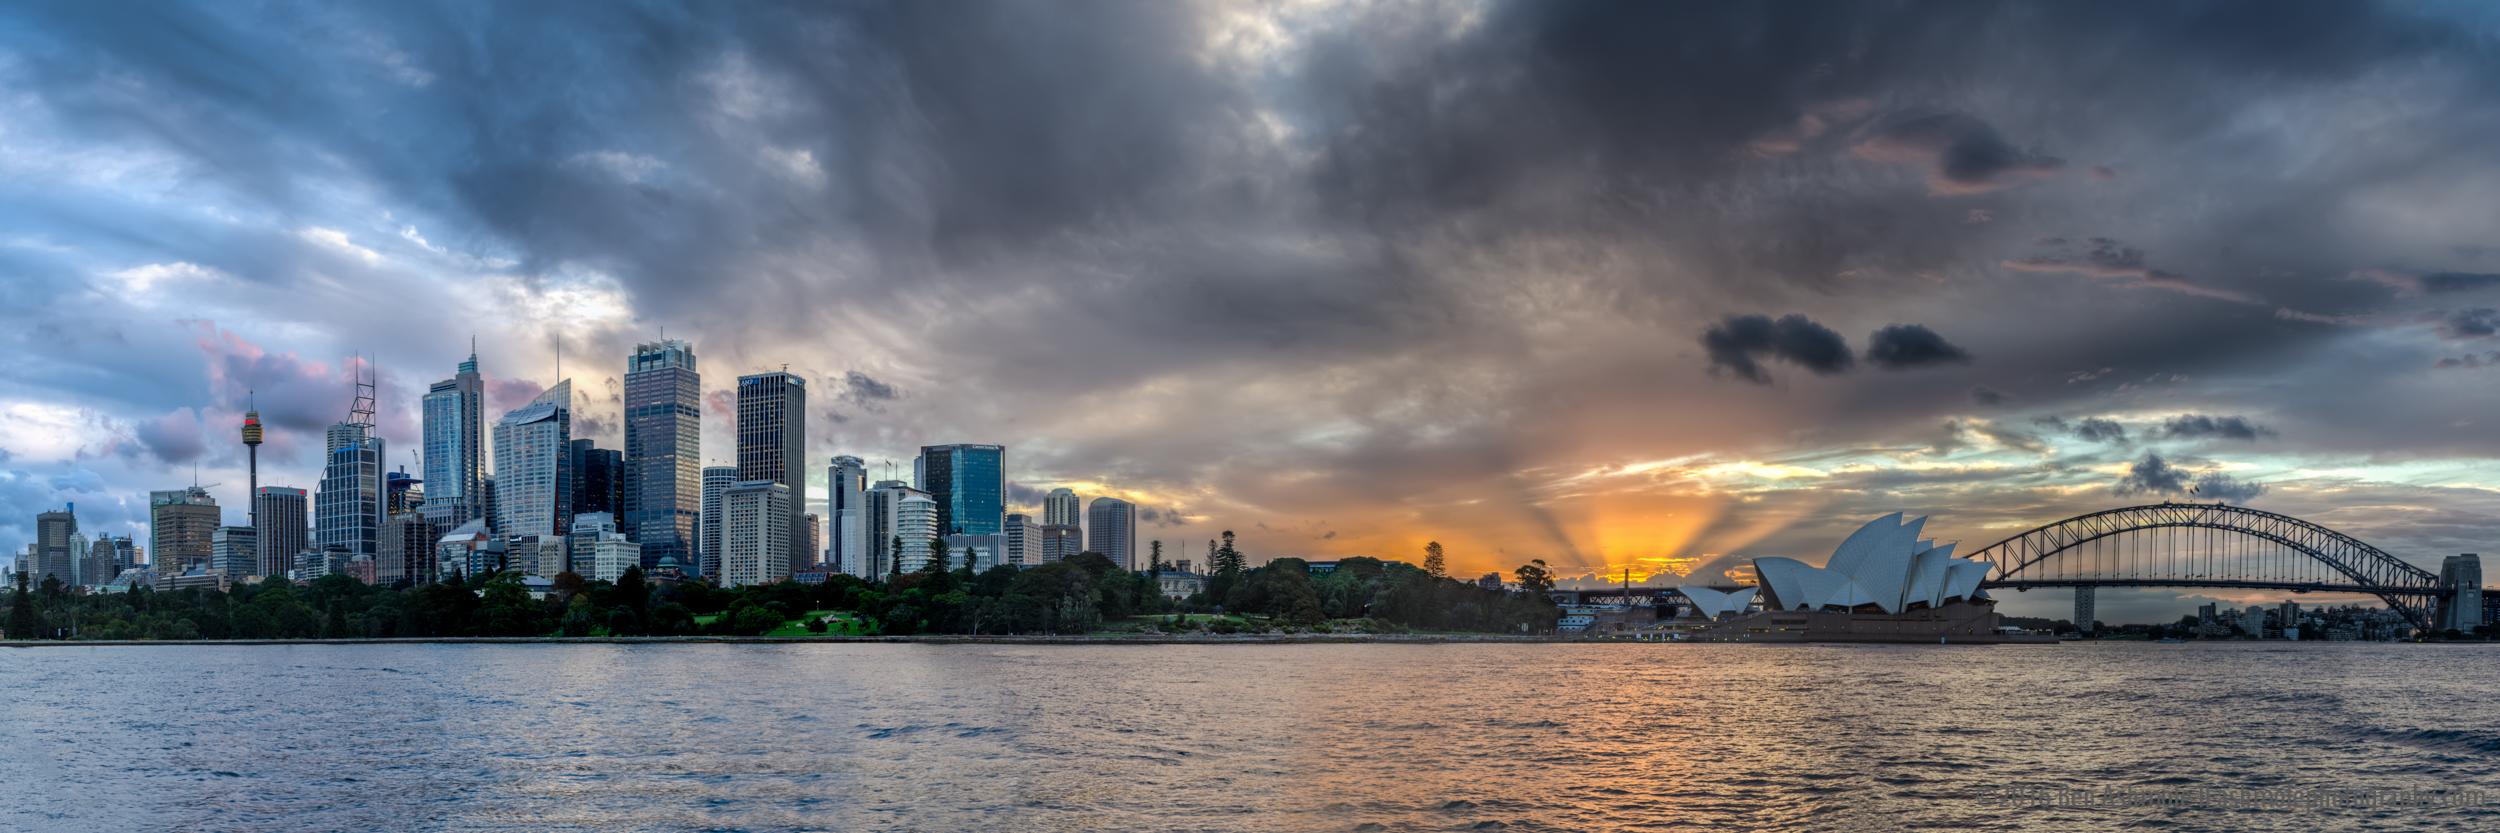 Sydney Sunset Panorama, New South Wales, Australia